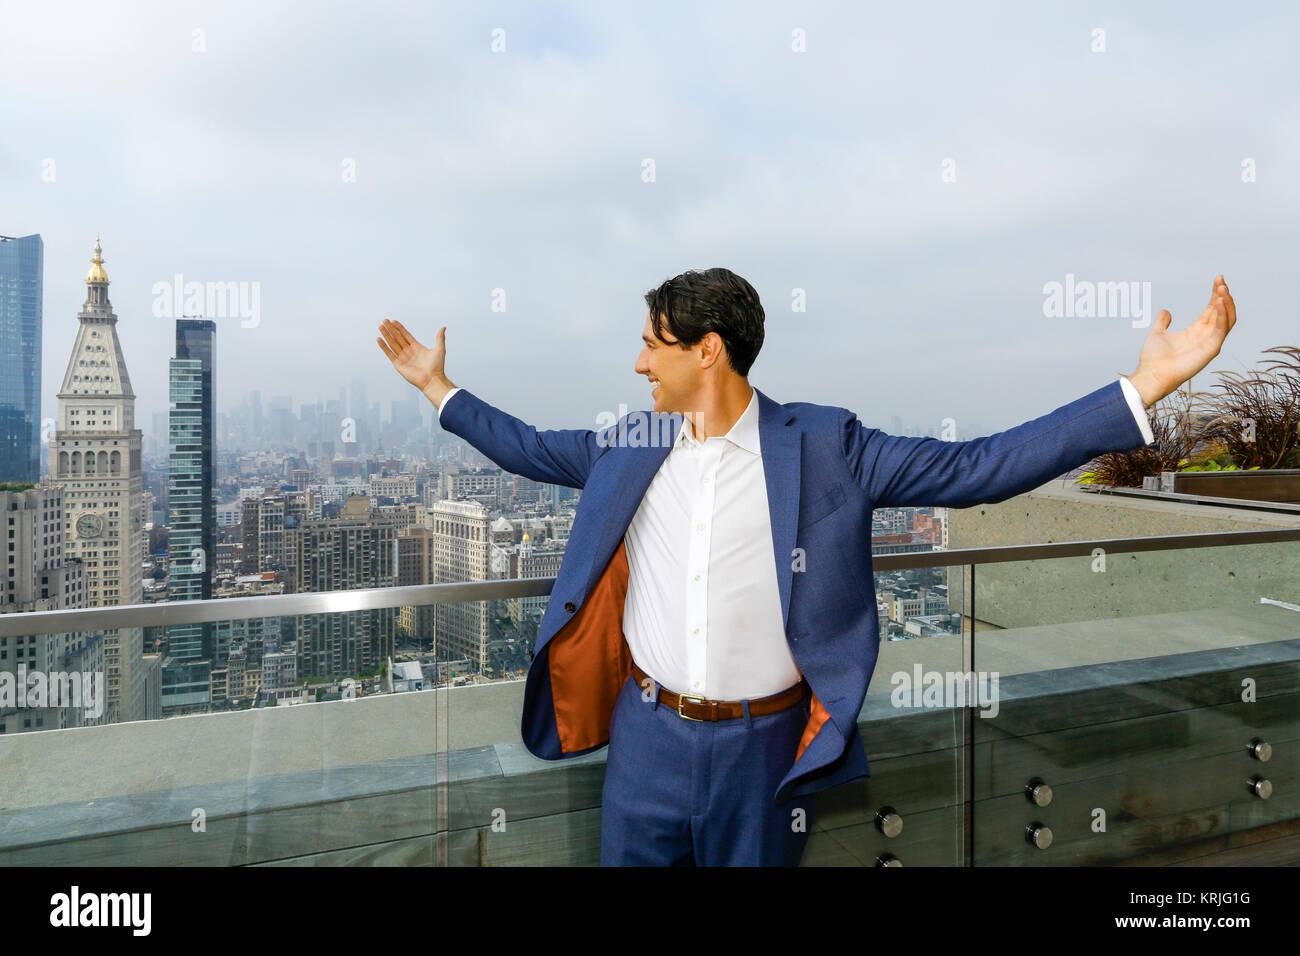 Caucasian businessman celebrating on urban rooftop - Stock Image